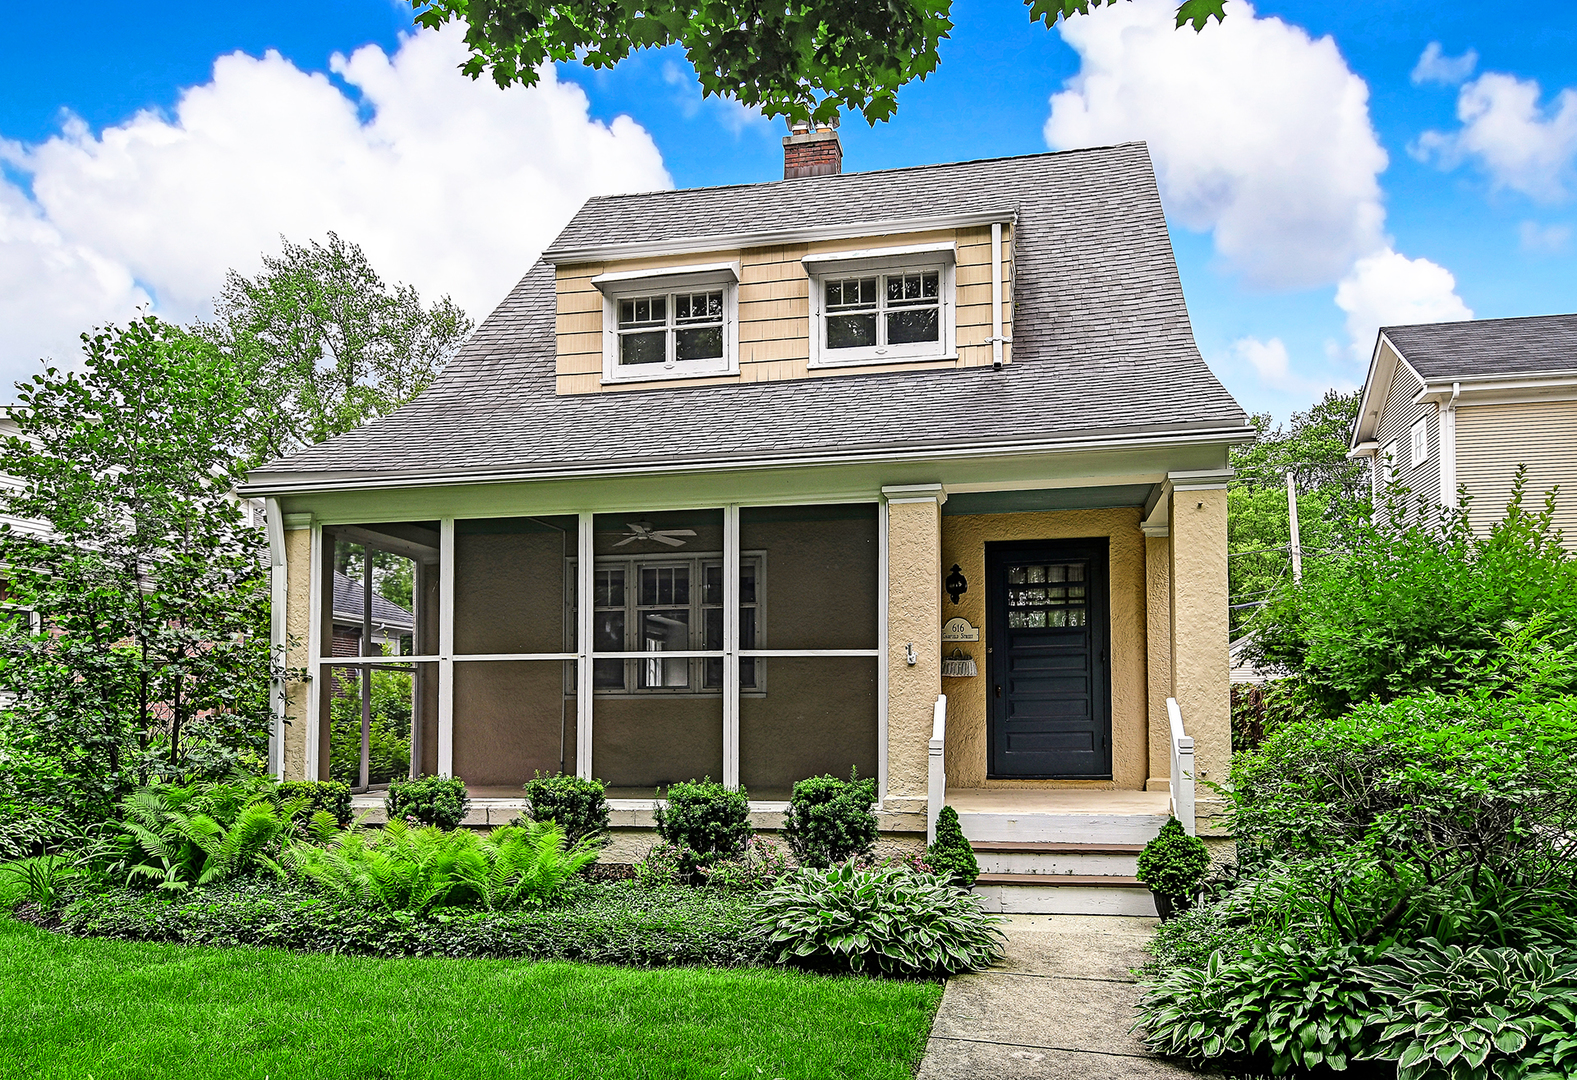 616 South Garfield, Hinsdale, Illinois, 60521